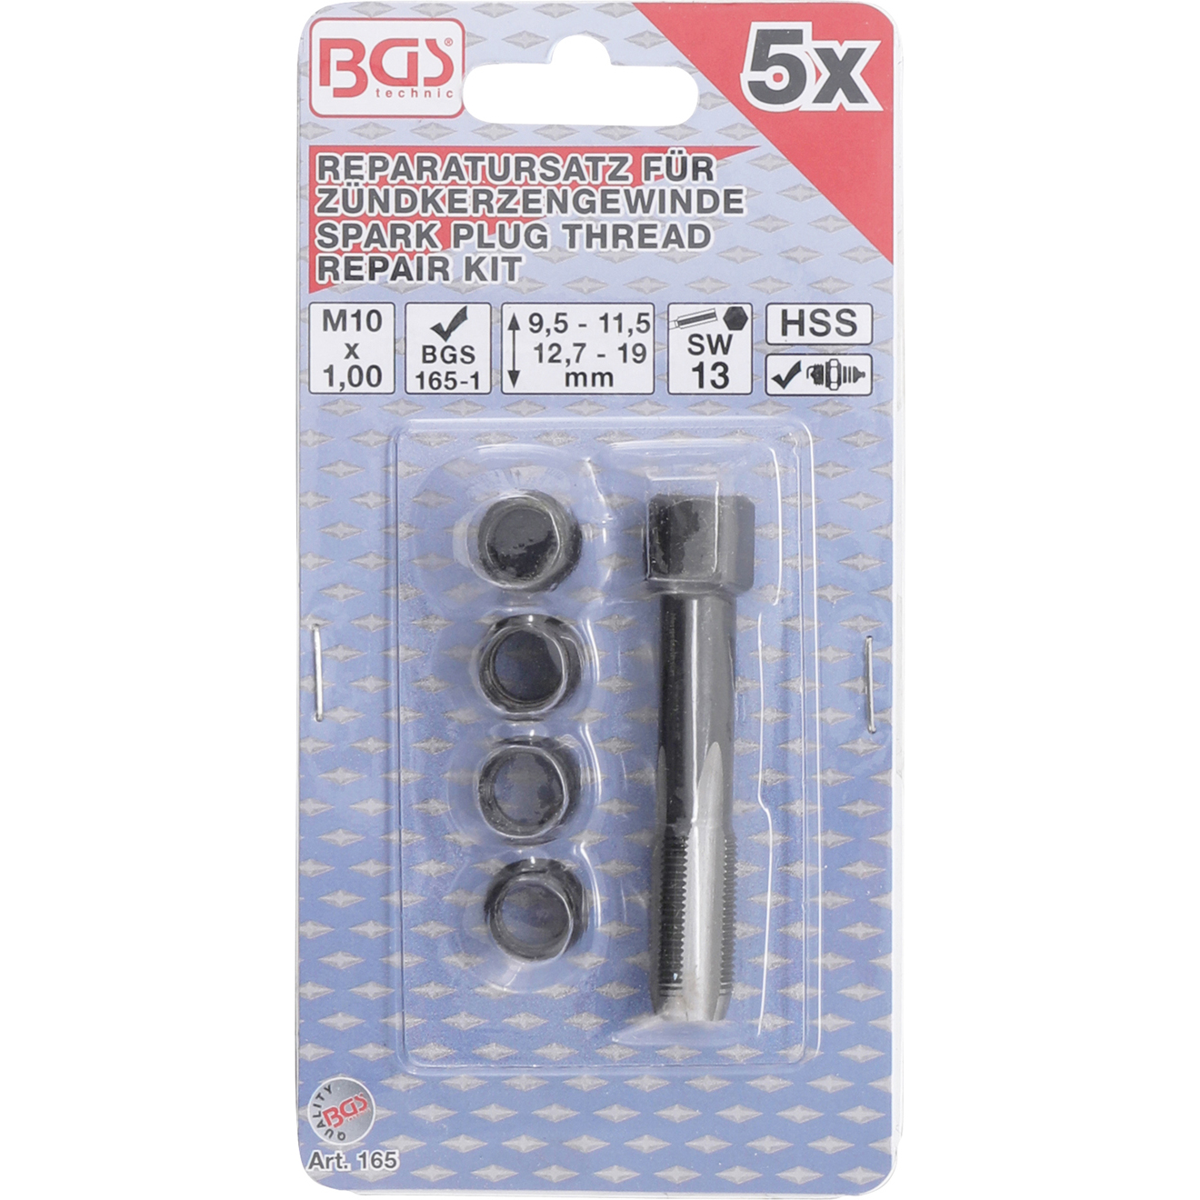 Spark Plug Thread Repair Kit M10 x 1.00